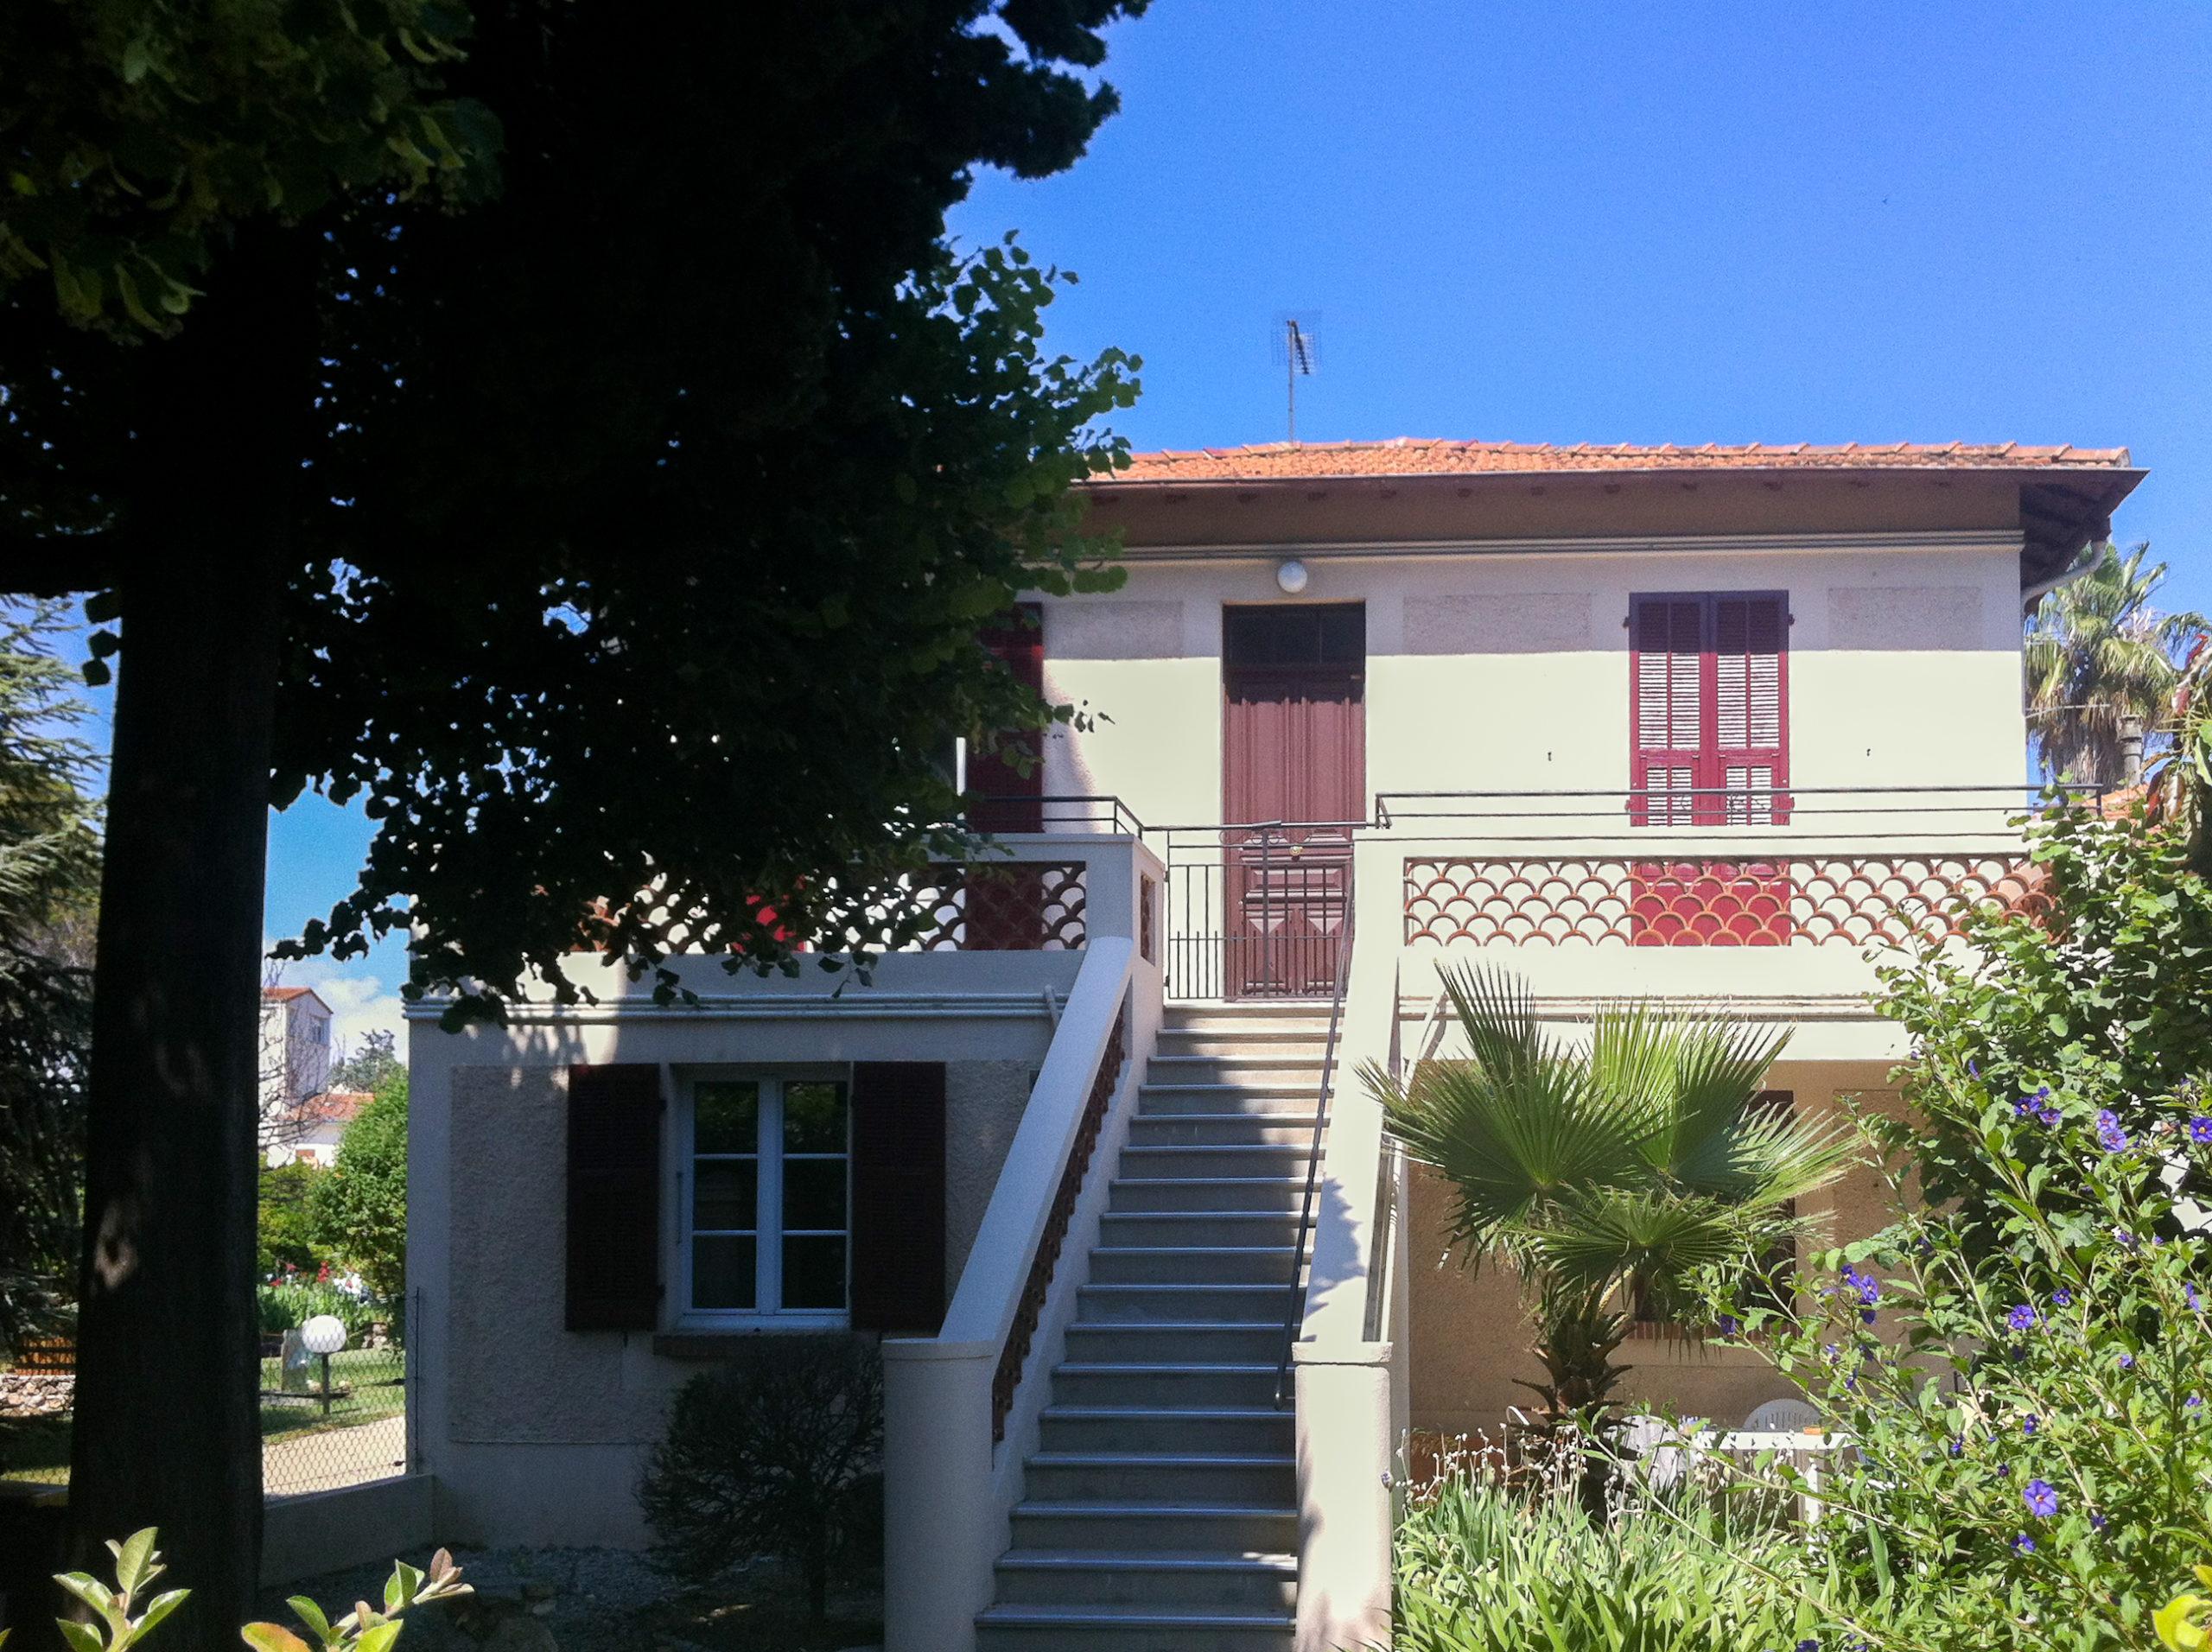 Location Cagnes/mer – 3 pièces Haut de Villa + 2 Parking